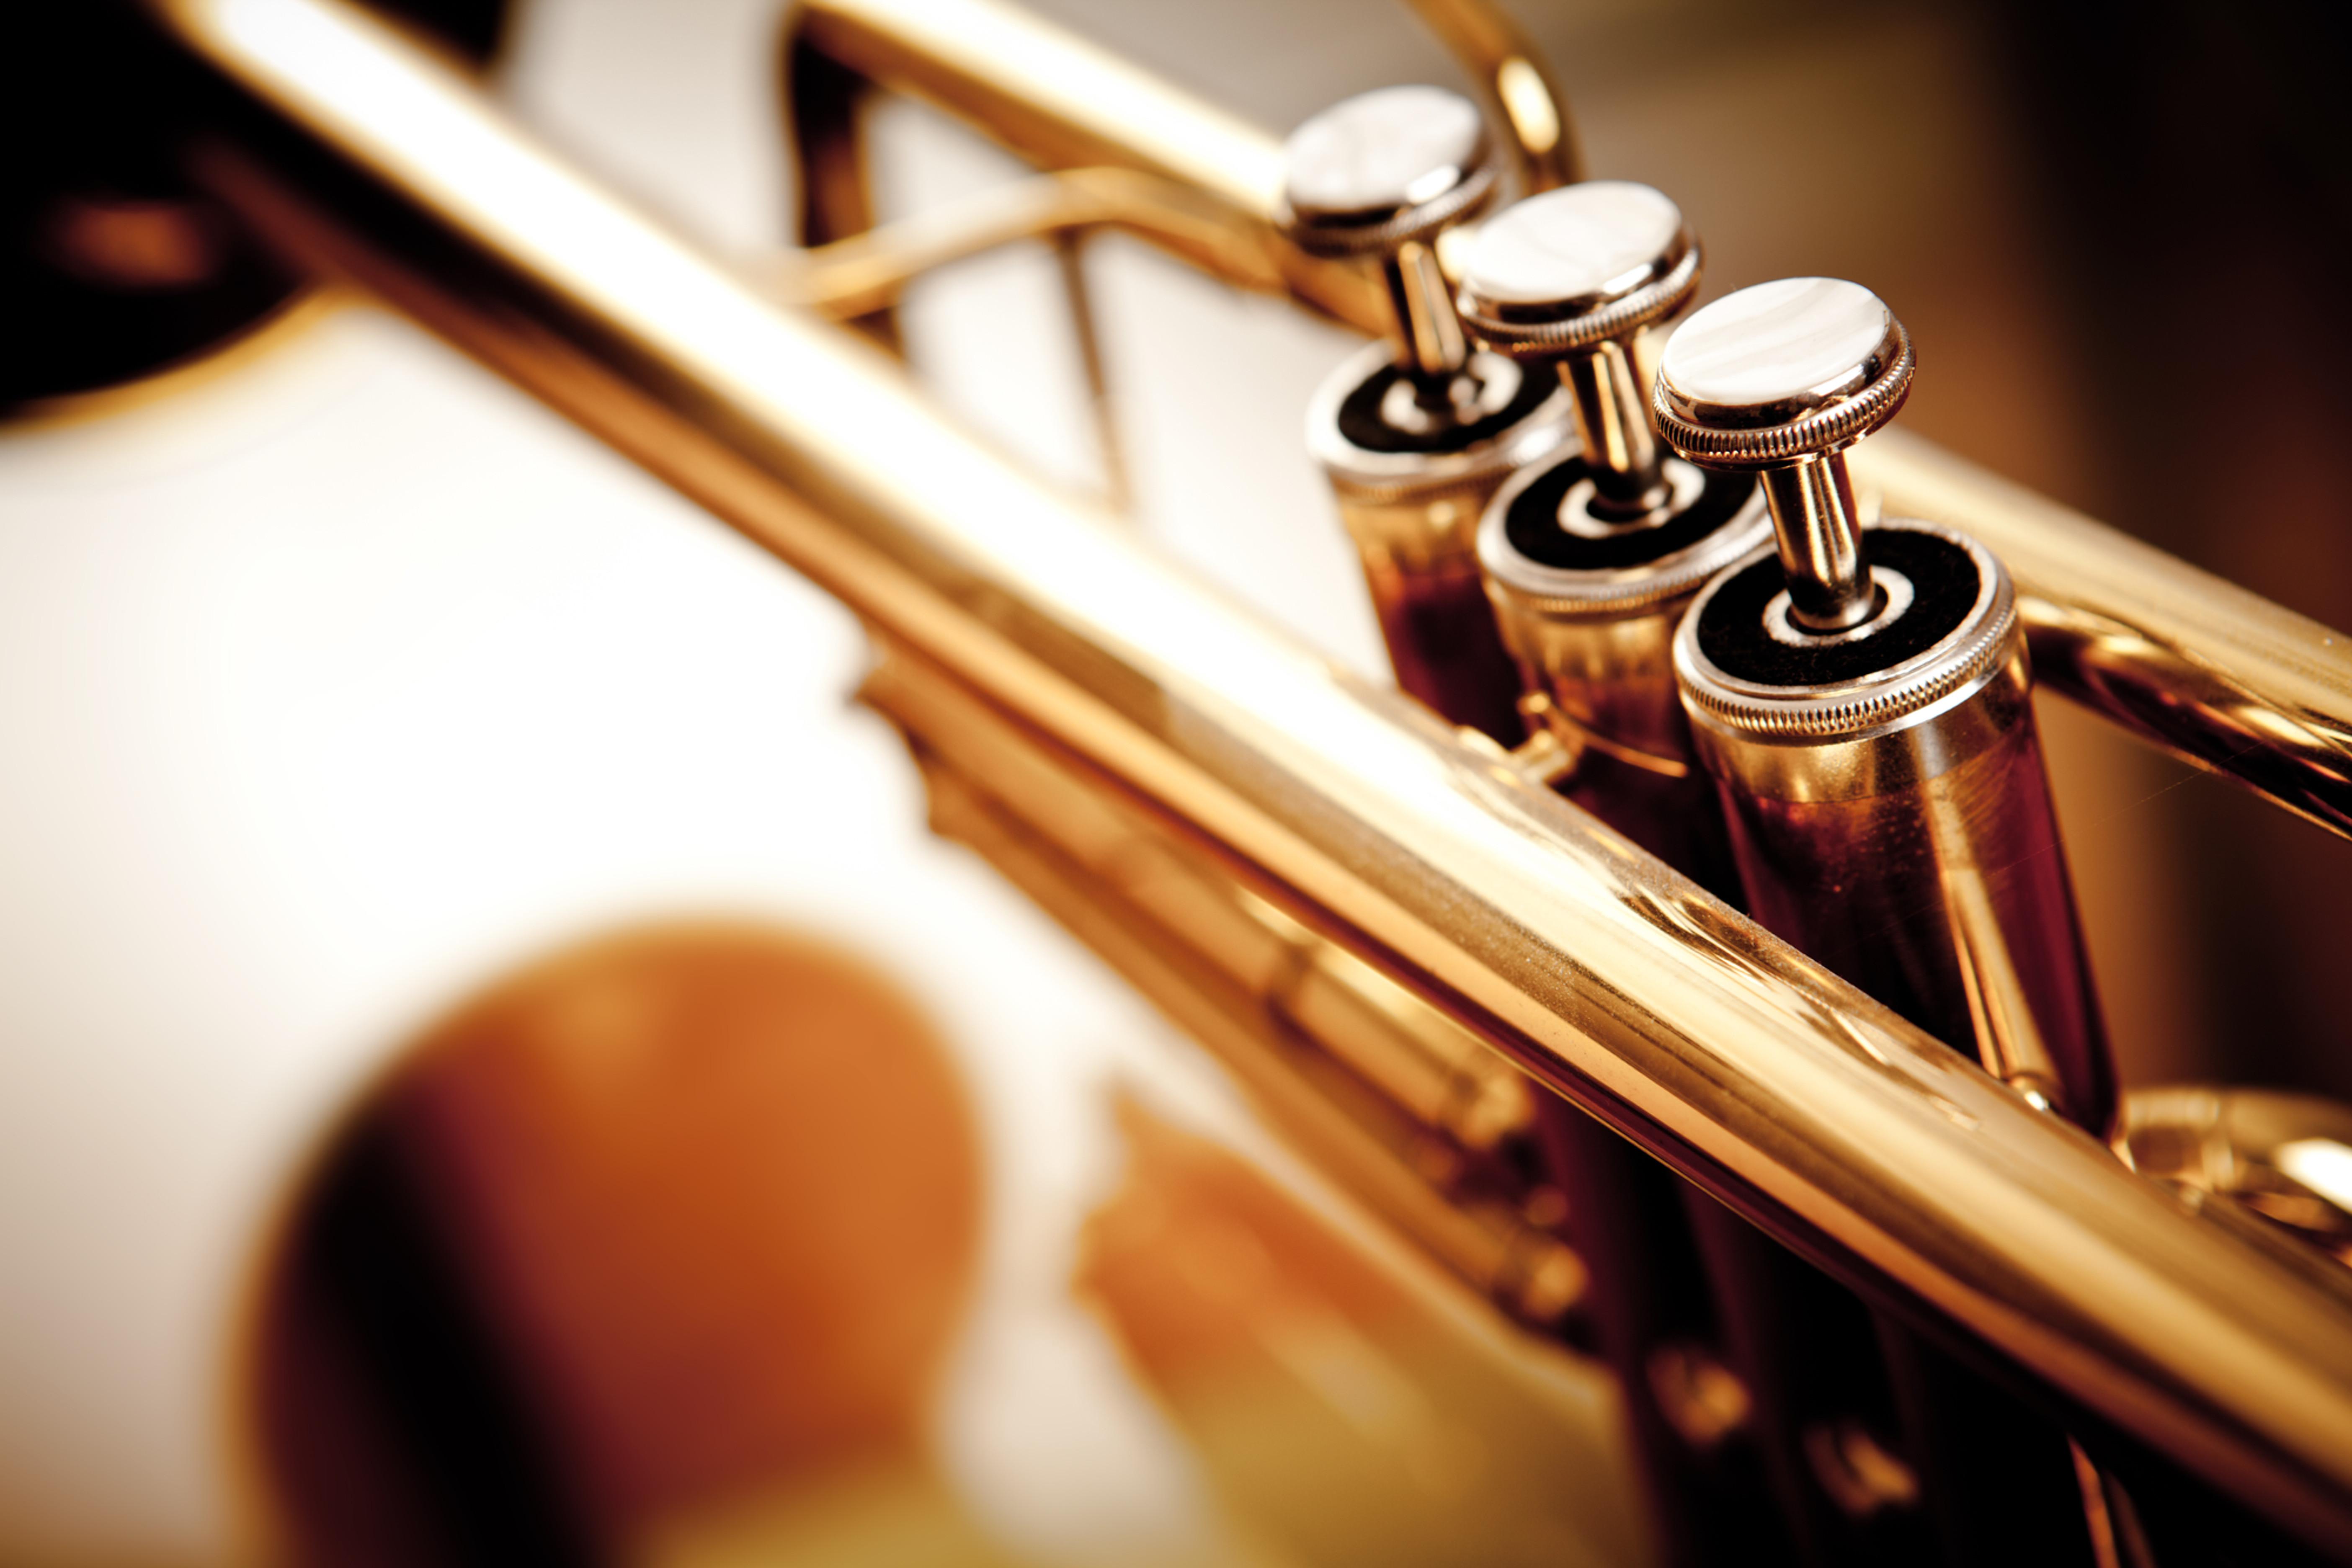 30 Minute Brass Tutorial - Junior School